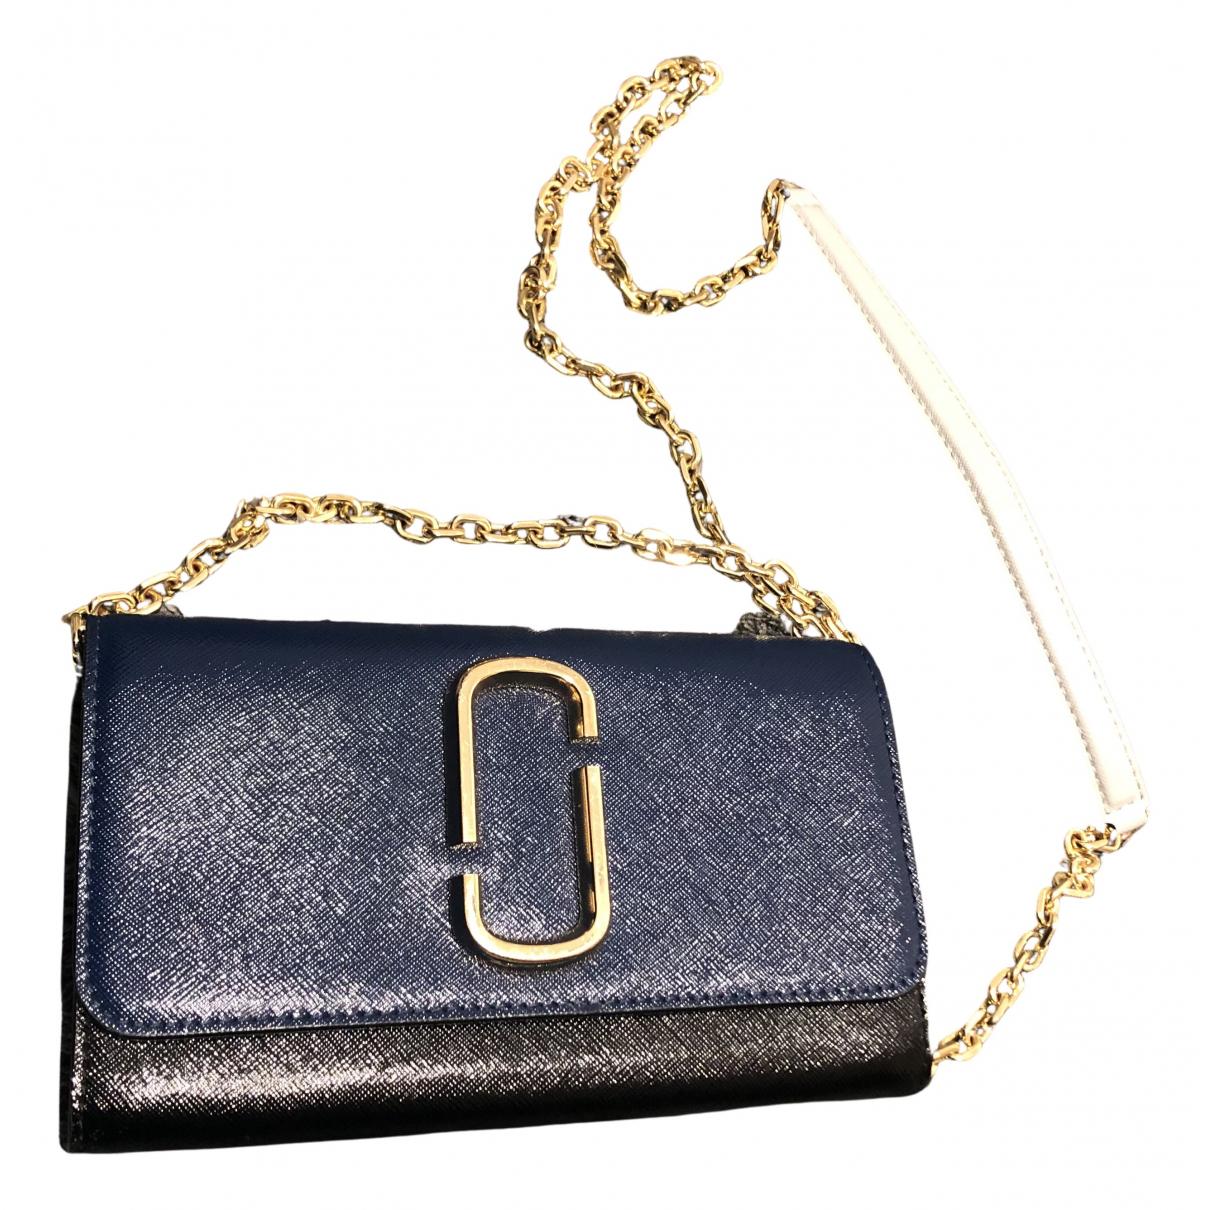 Marc Jacobs Snapshot Handtasche in  Schwarz Leinen